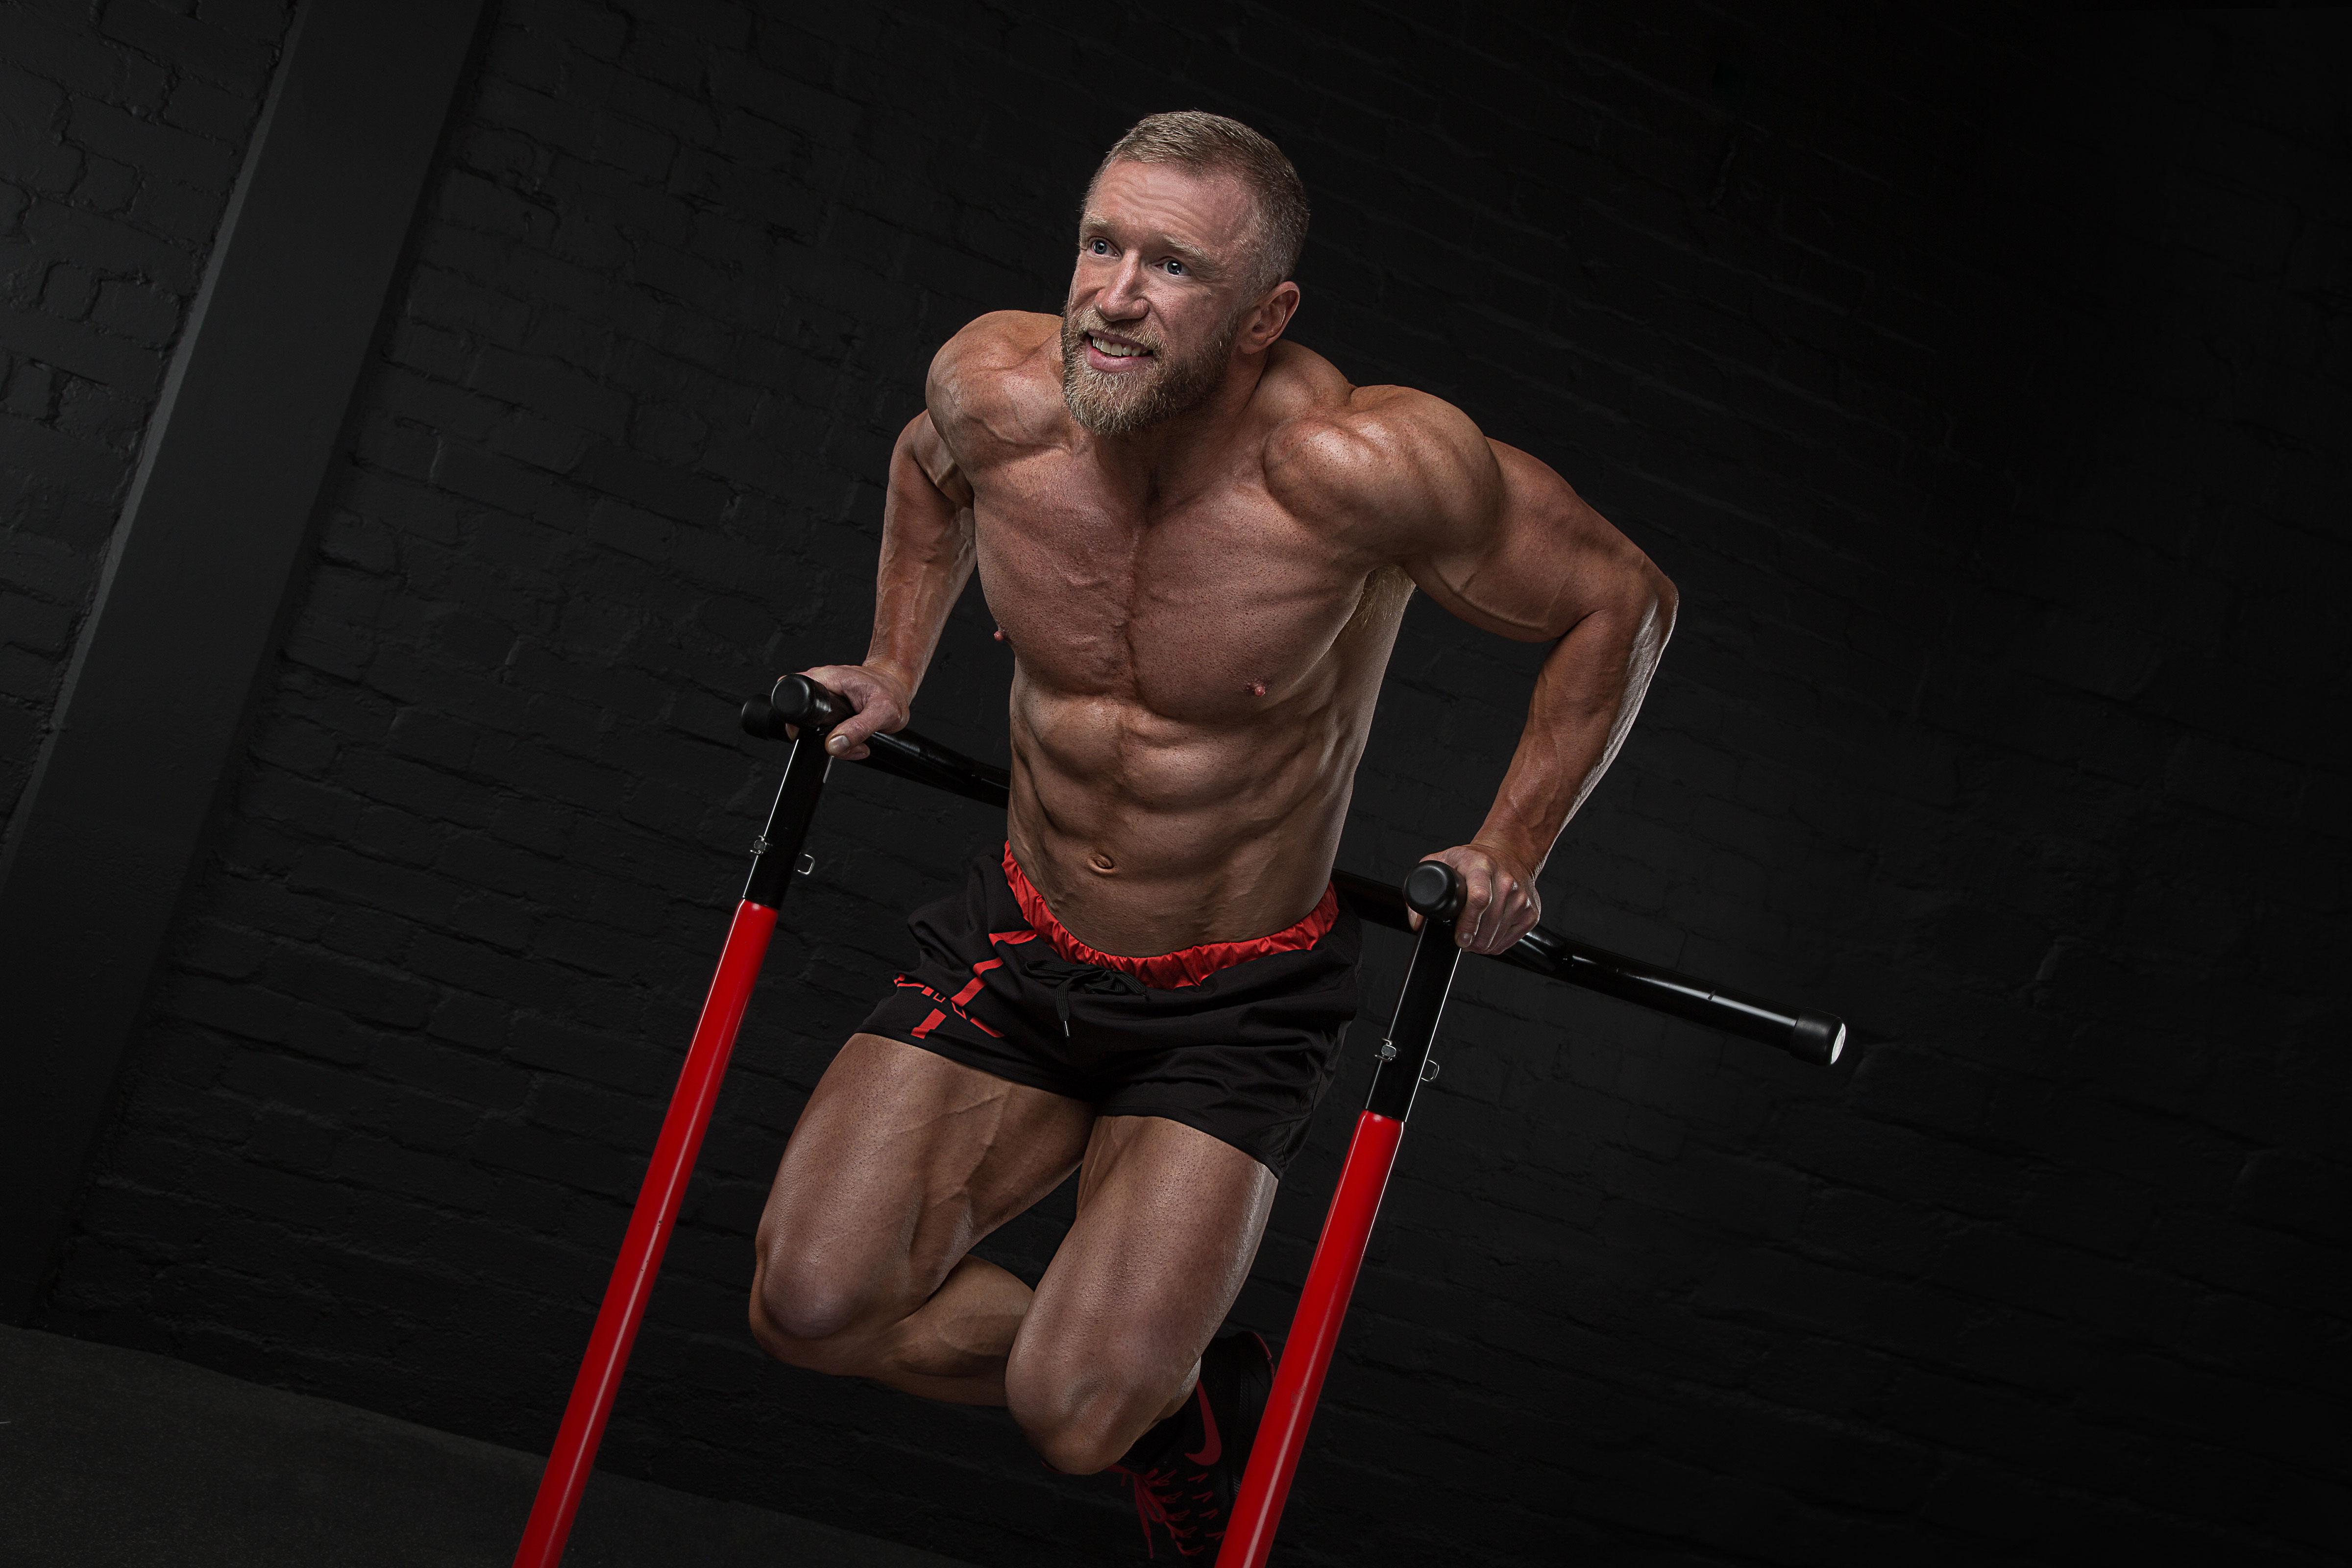 http://Bodybuilding%20Photography